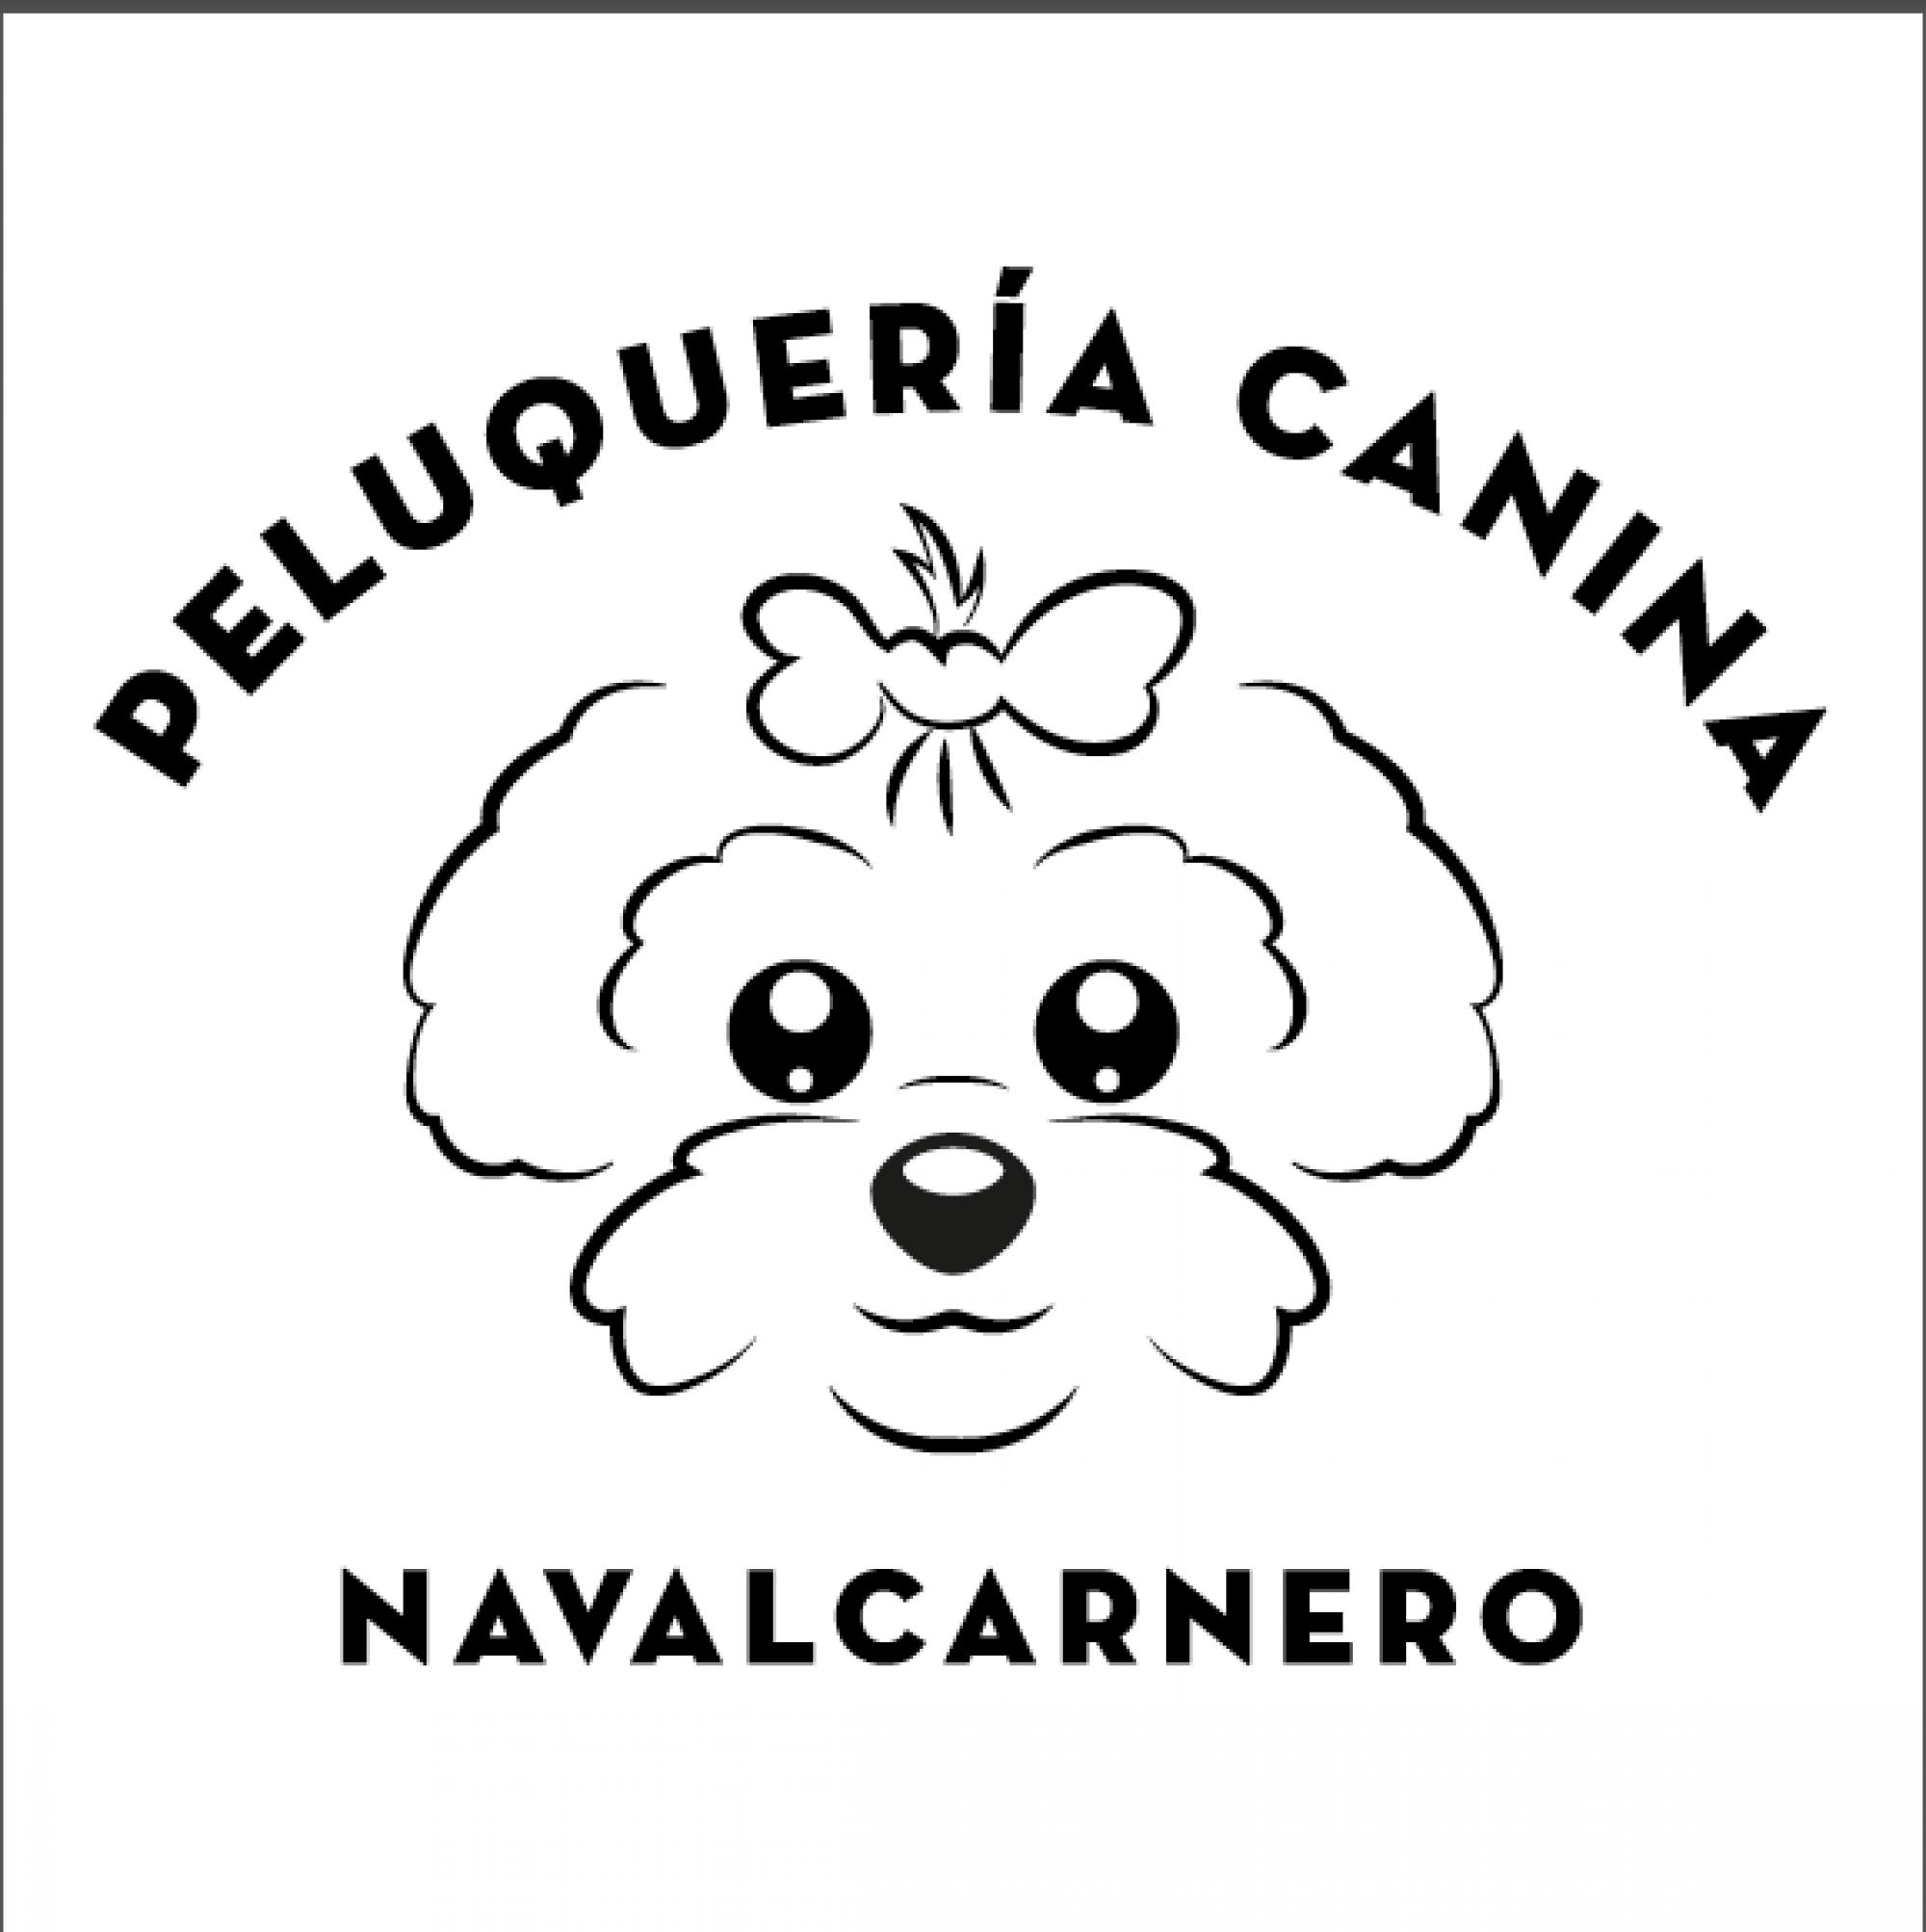 peluqueria canina navalcarnero, peluqueria canina, estetica canina, cosmetica canina, baño perro, champu para perro,